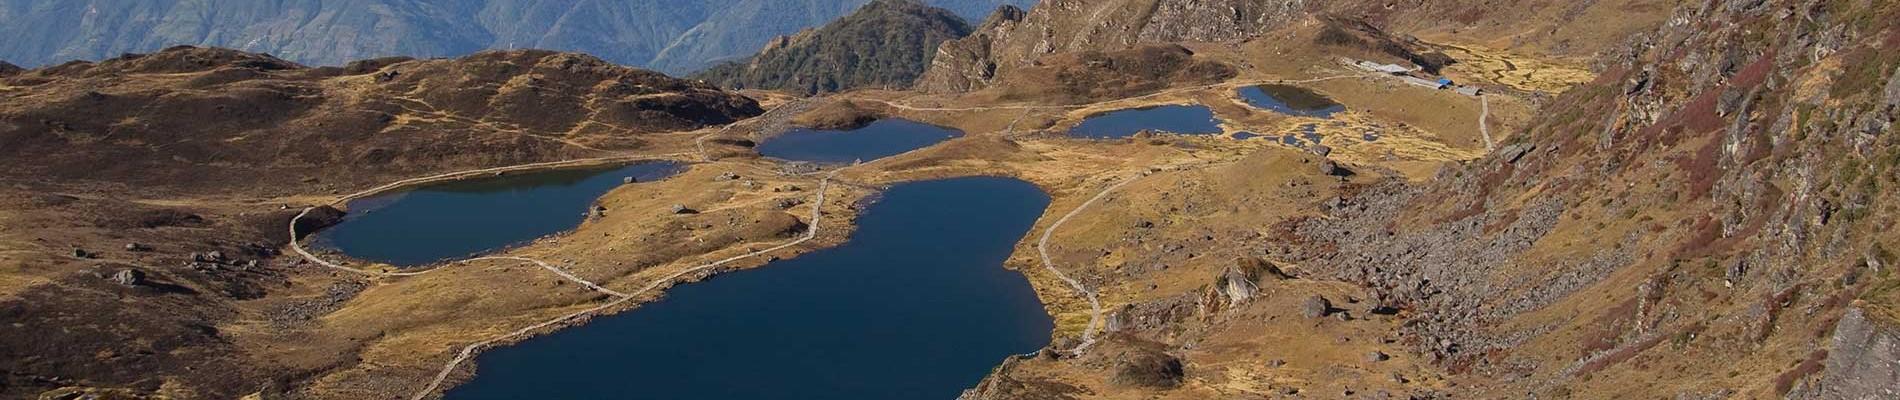 Nepal: Panch Pokhari Trek